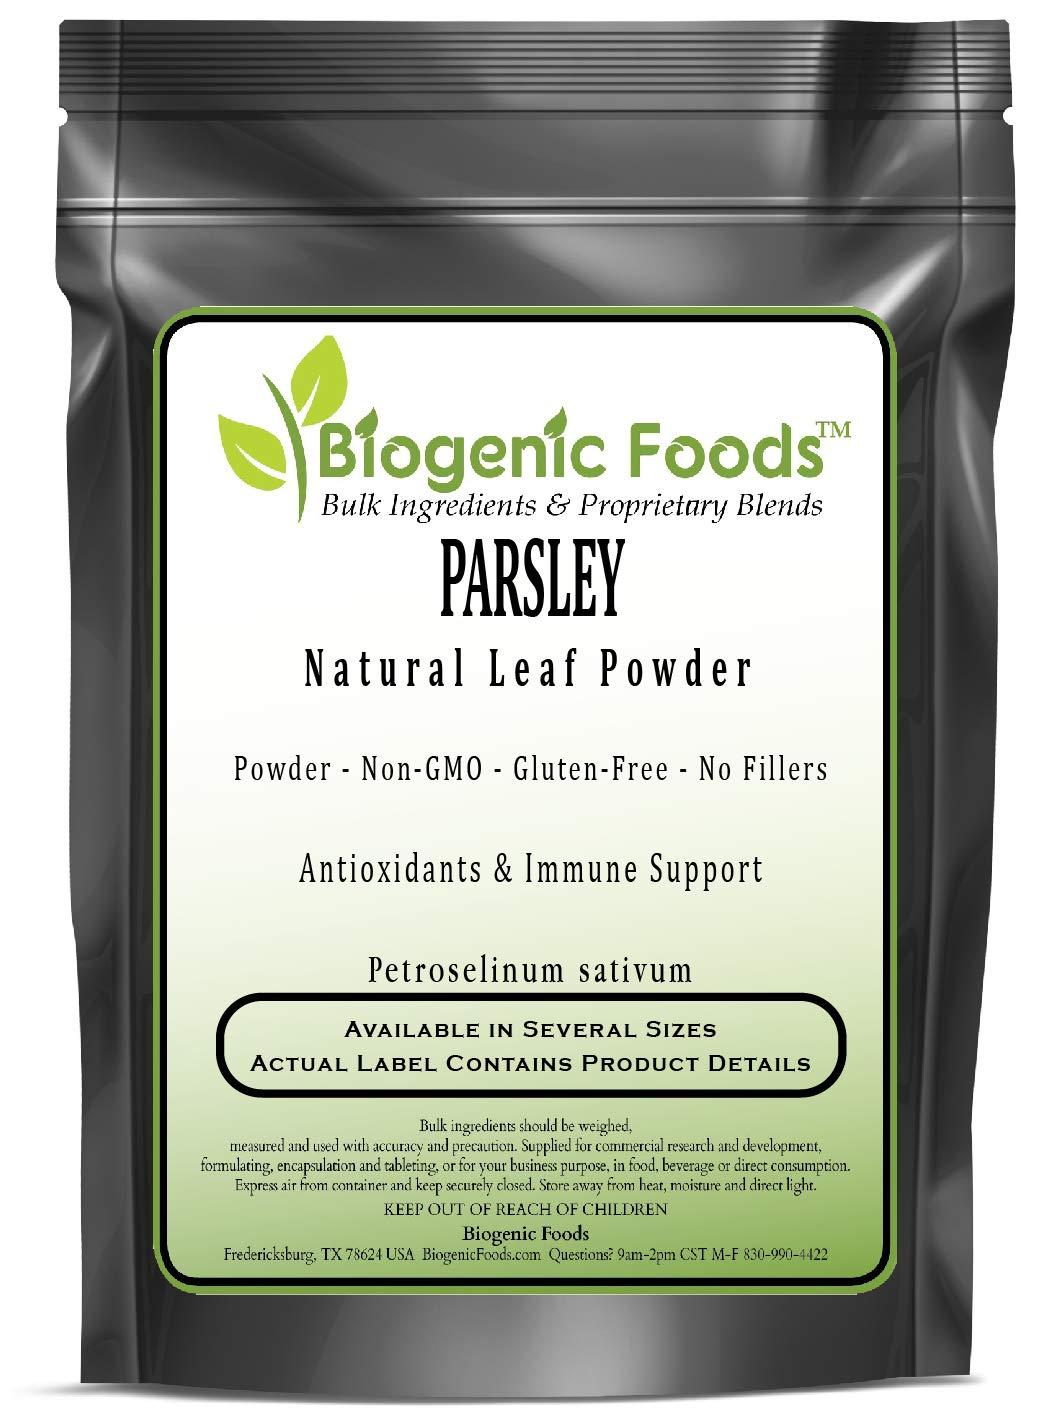 Parsley - Natural Leaf Powder (Petroselinum sativum), 1 kg